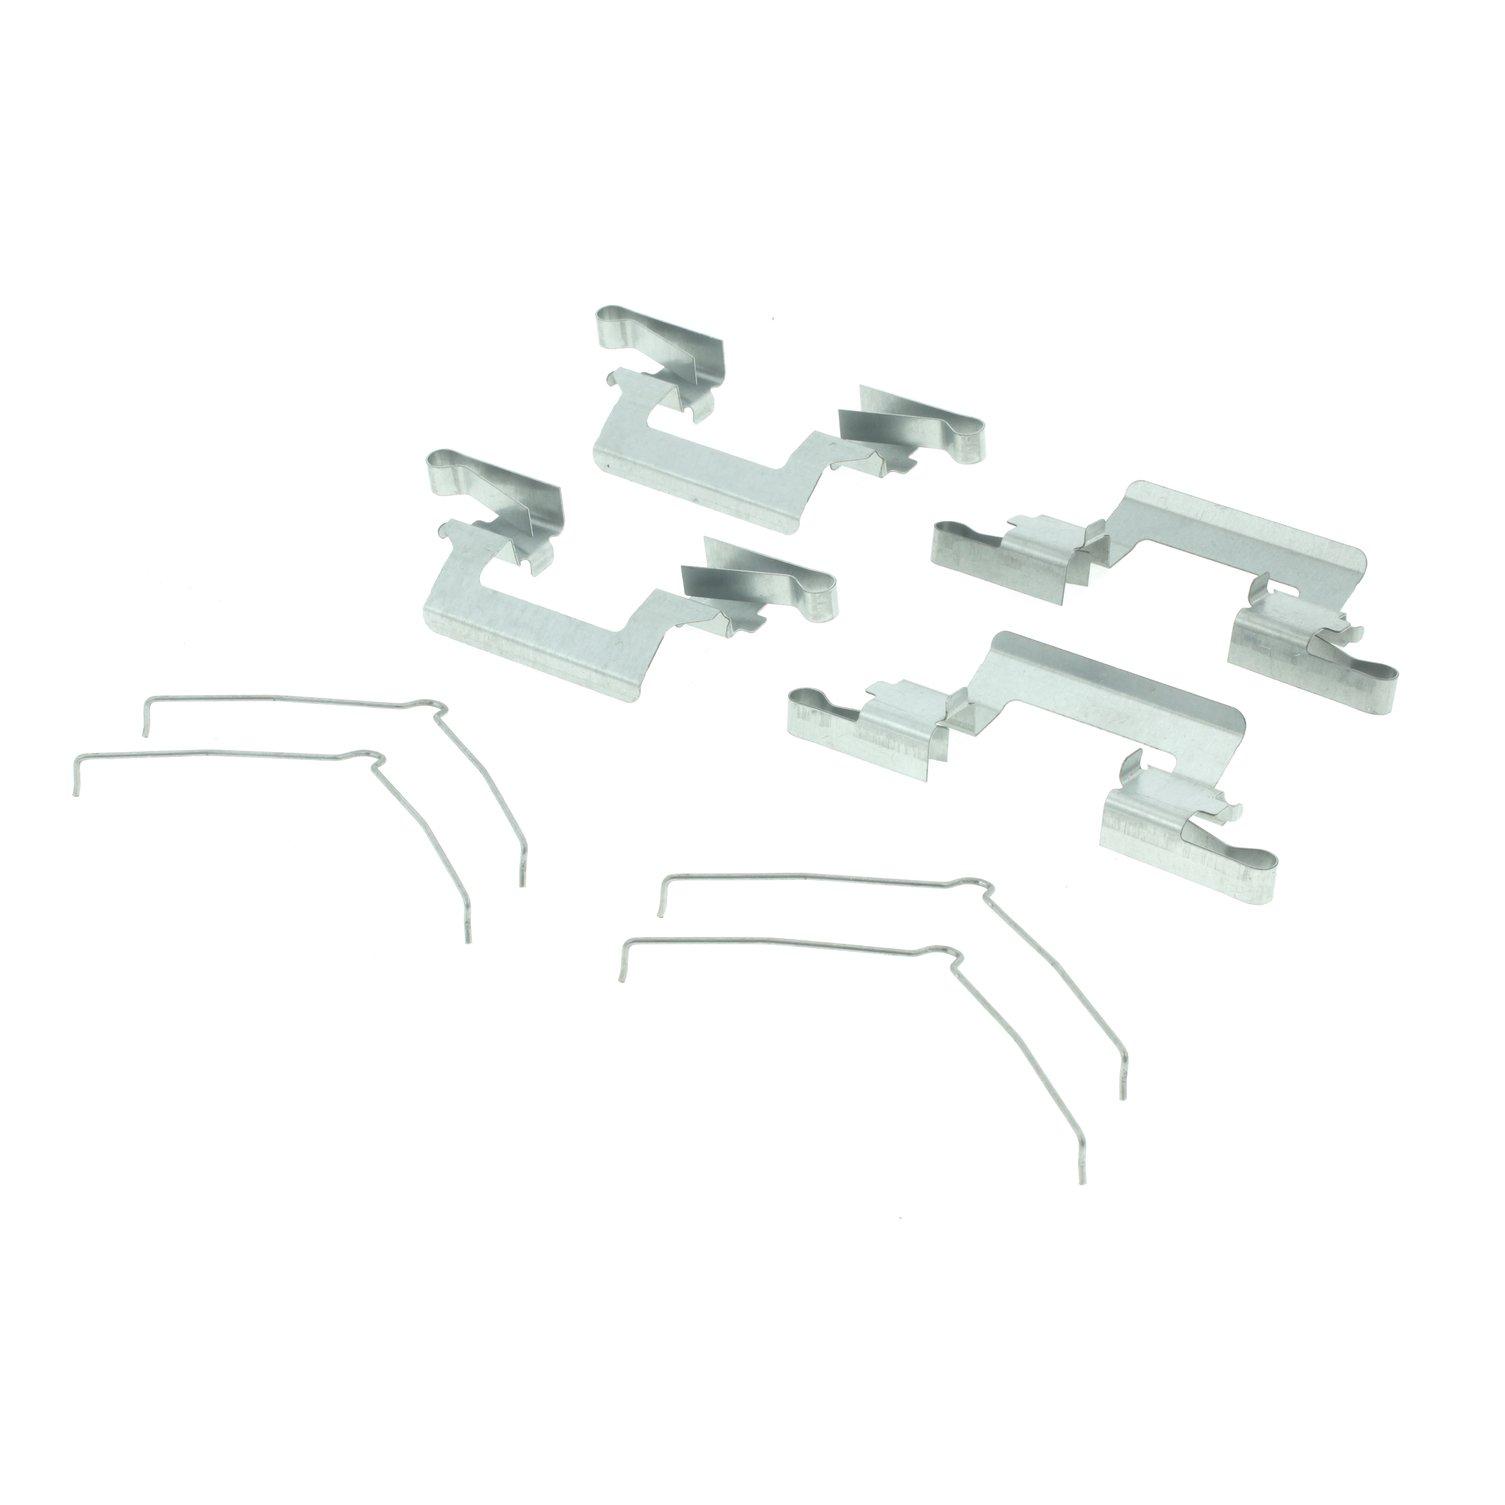 2001 Infiniti Qx4 Disc Brake Pad Set Wiring Harness Ce 10606911